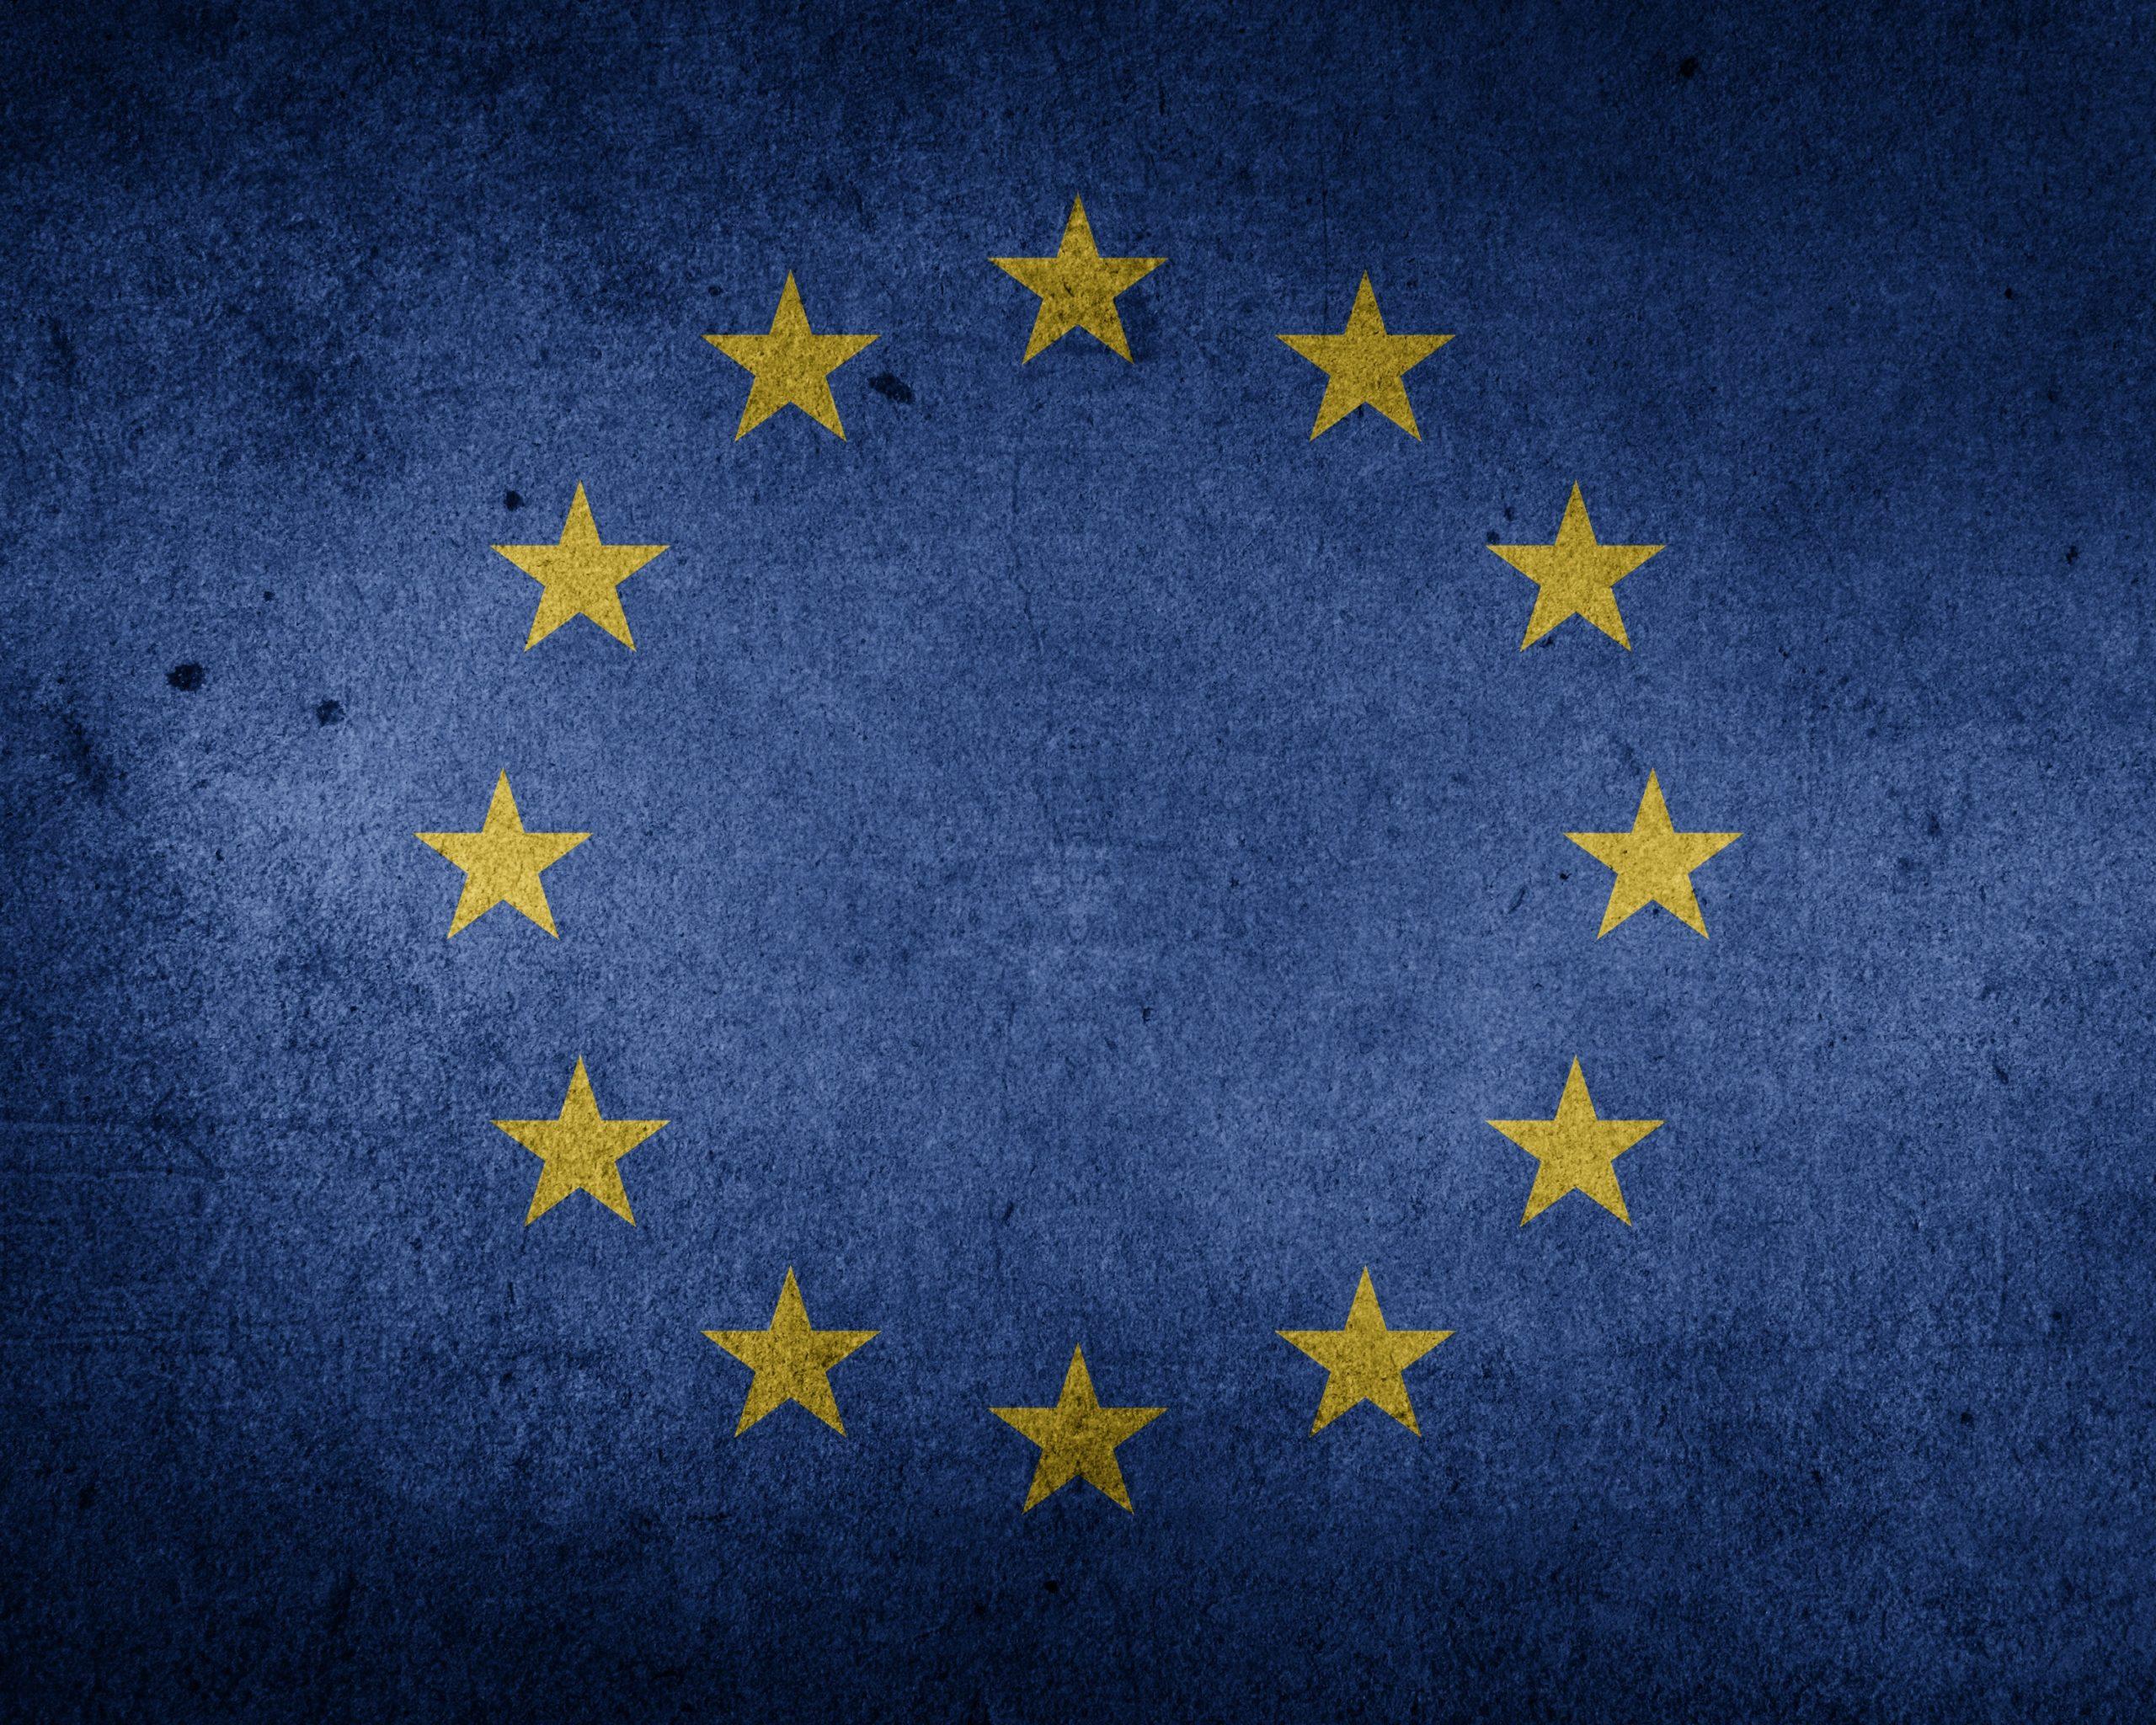 The Flag of the European Union Grunge HD Wallpaper 2560x2048